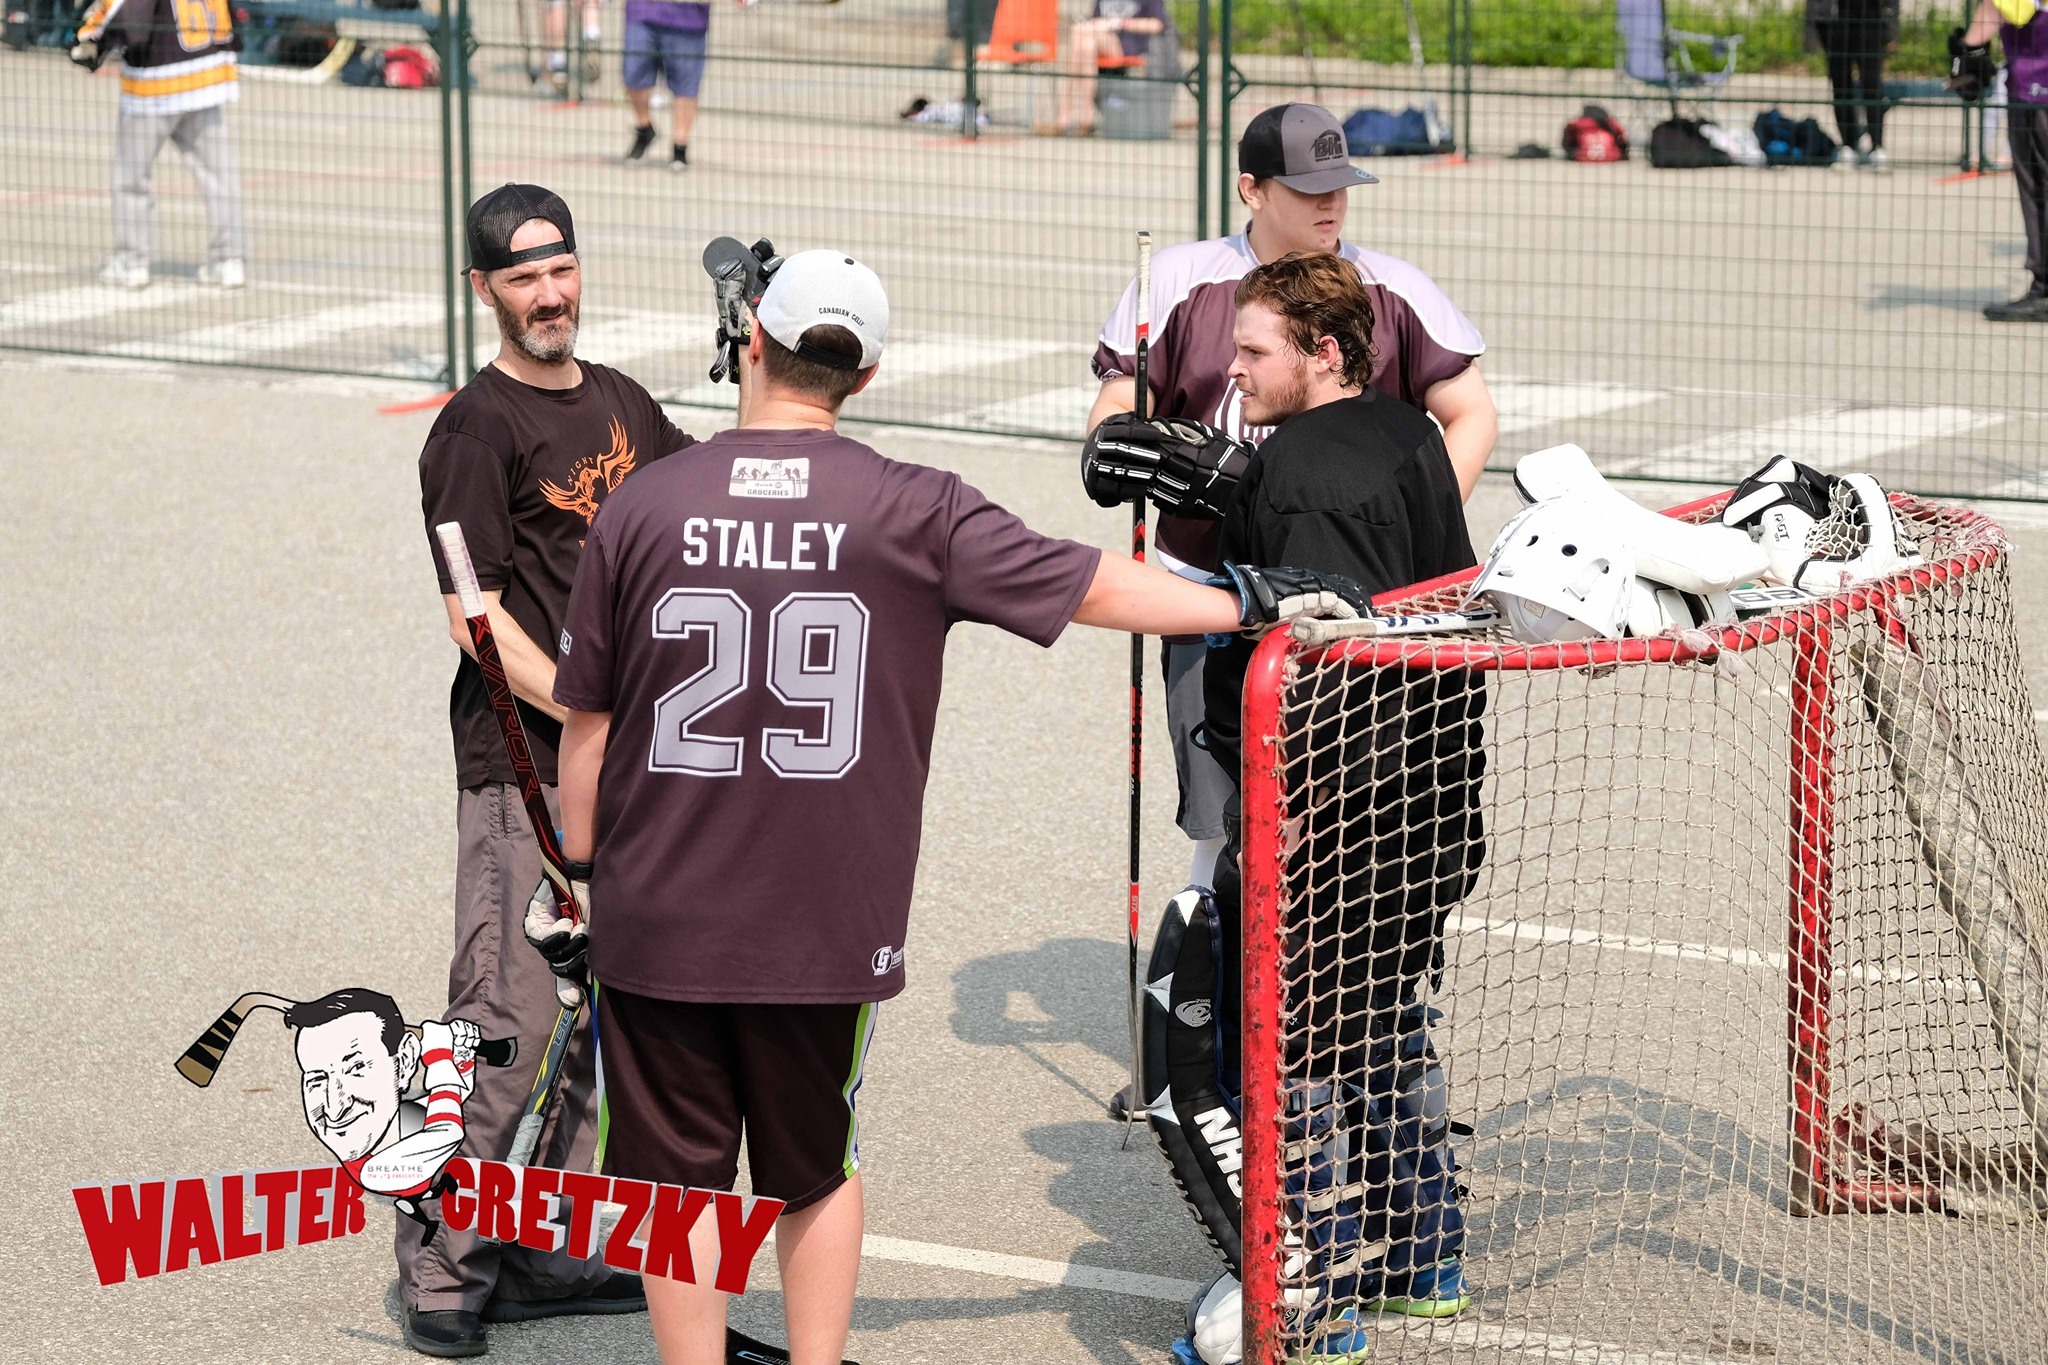 View Askew Street Hockey League